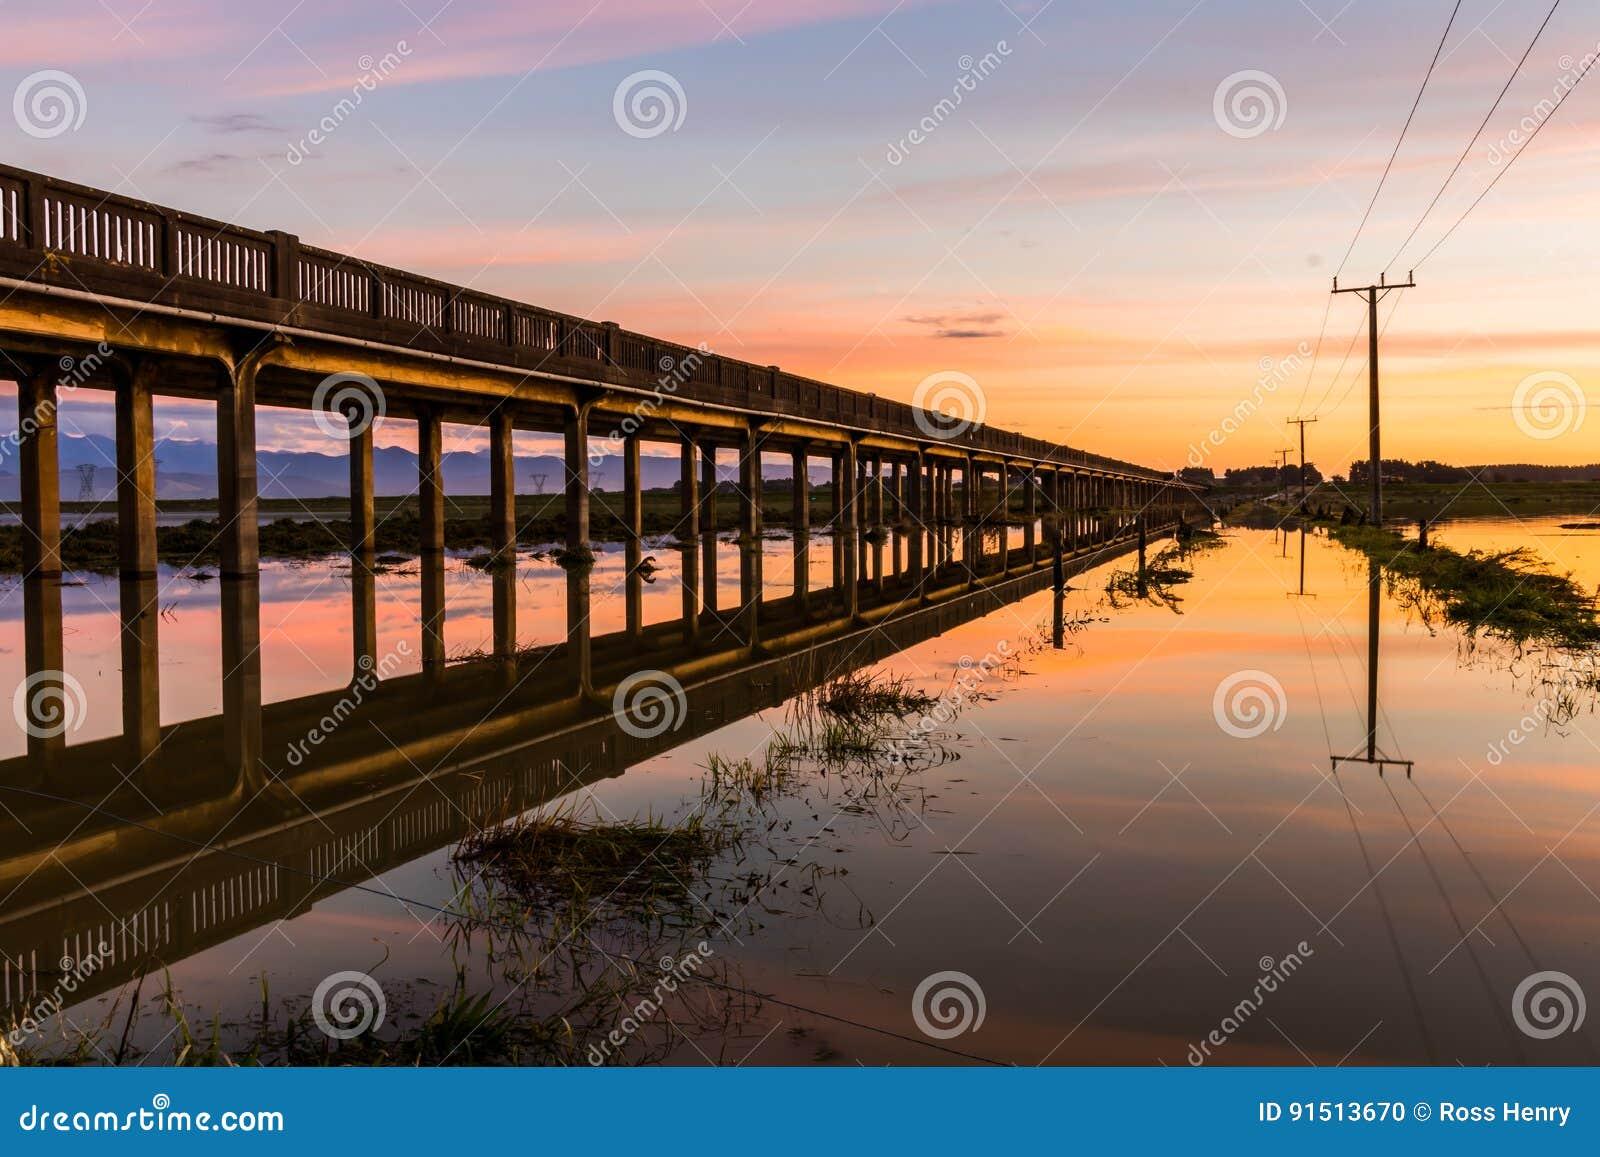 Whirokino Trestle Bridge